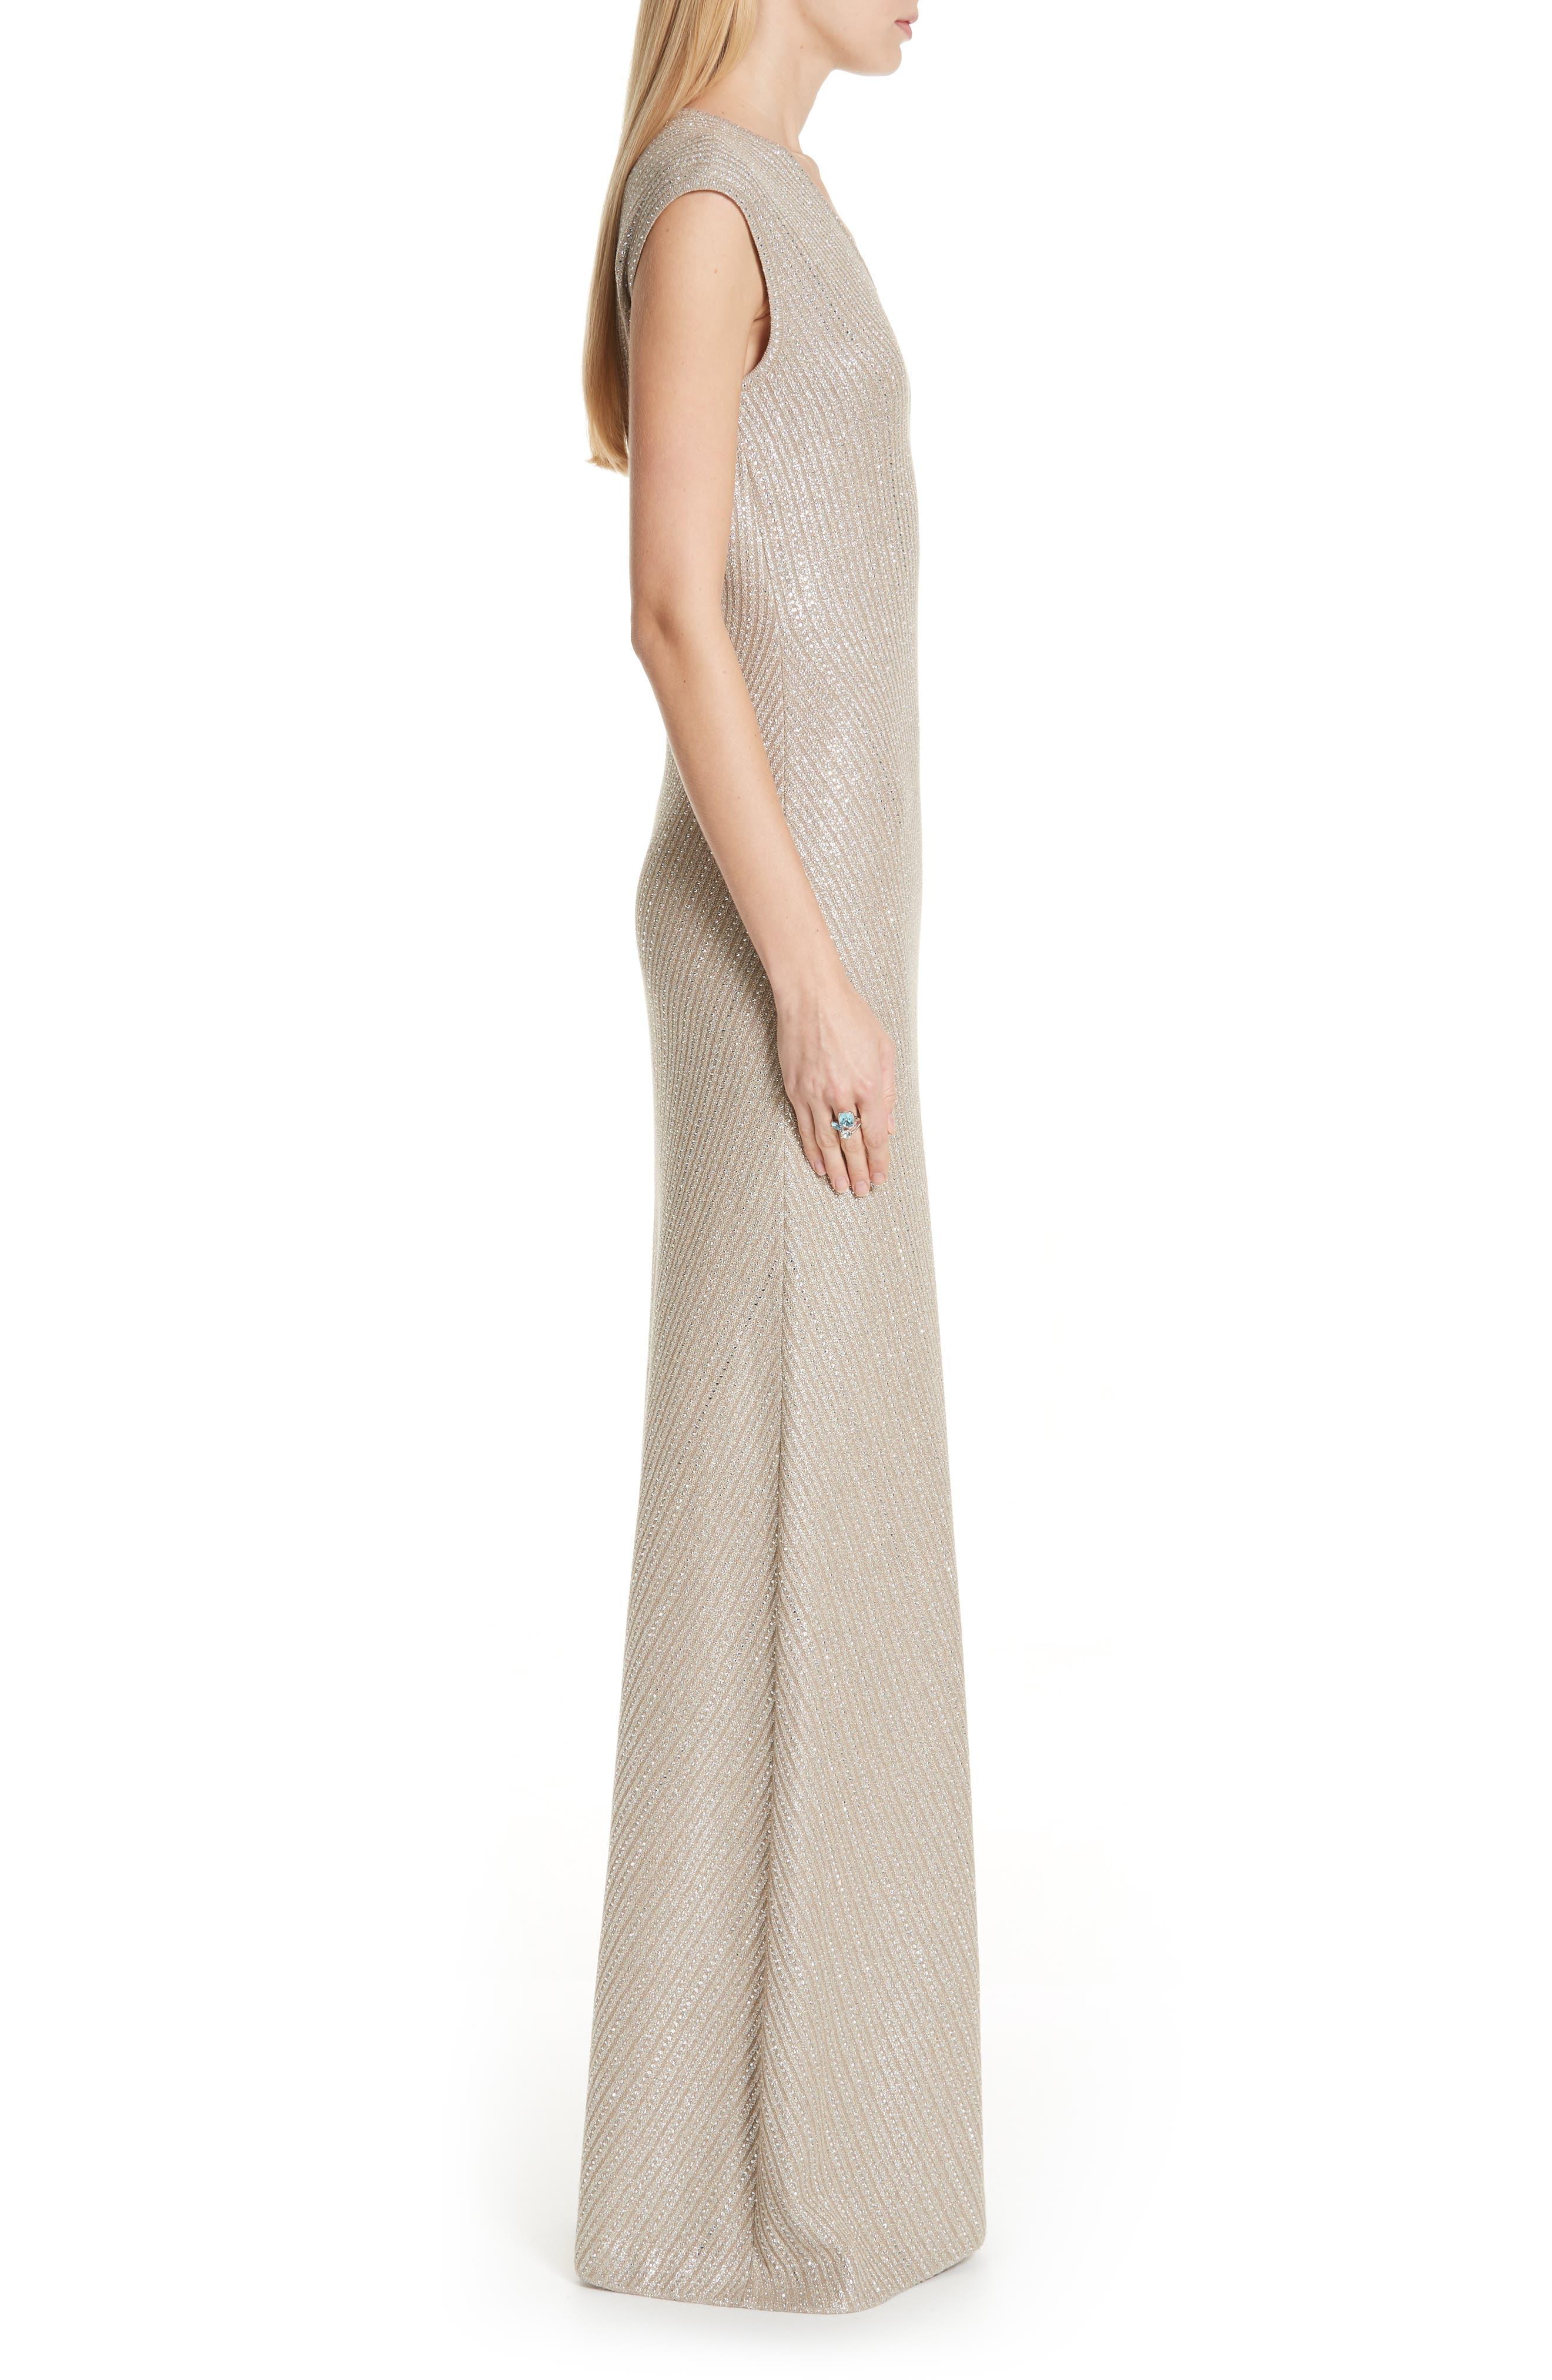 ST. JOHN COLLECTION, Brielle Knit V-Neck Gown, Alternate thumbnail 3, color, DARK KHAKI/ GOLD